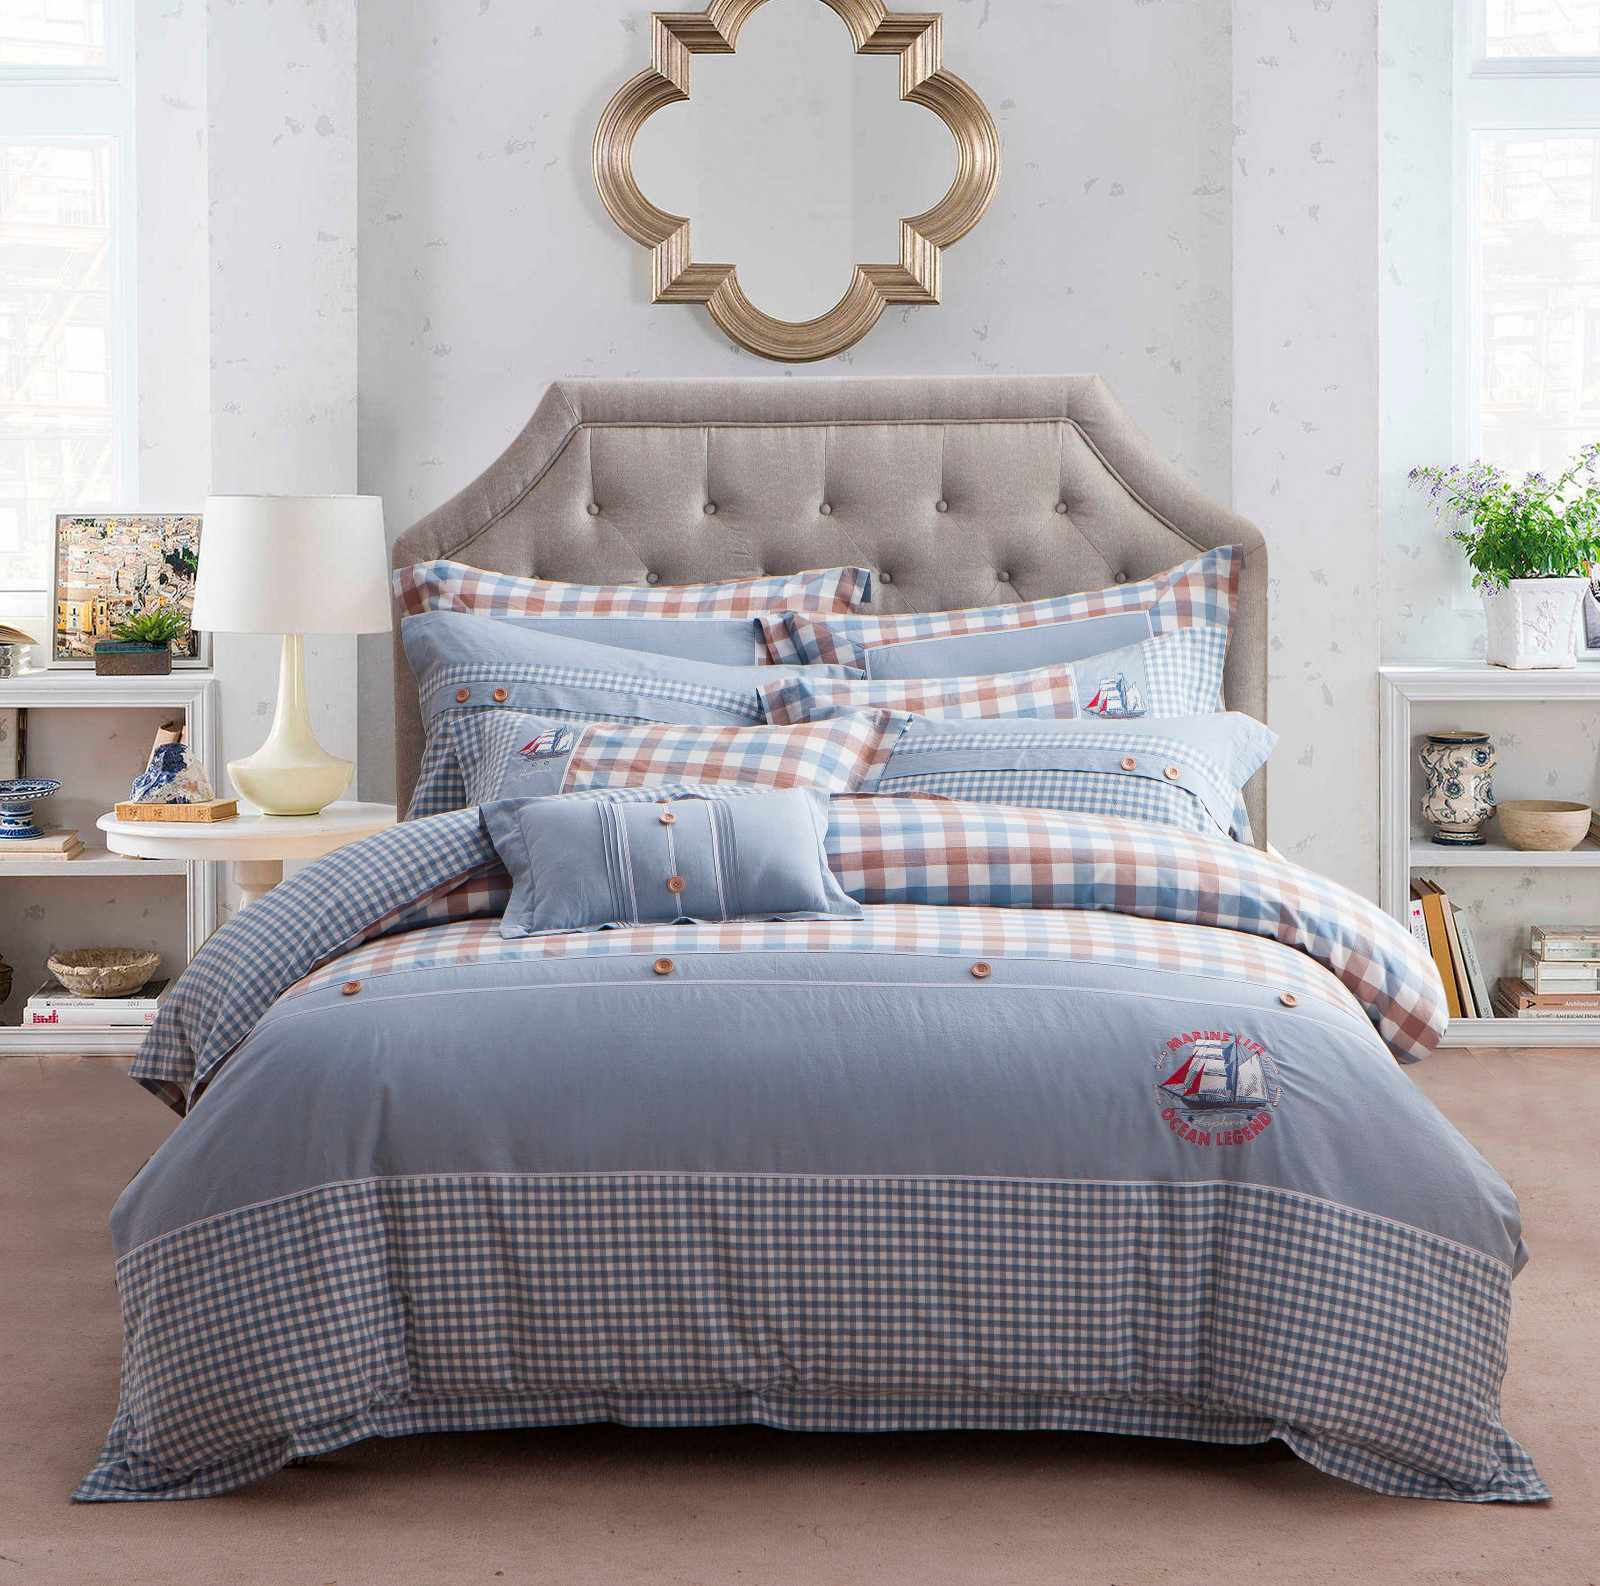 Daphne Brand printed set 100 cotton bedding sets adorable gorgeous